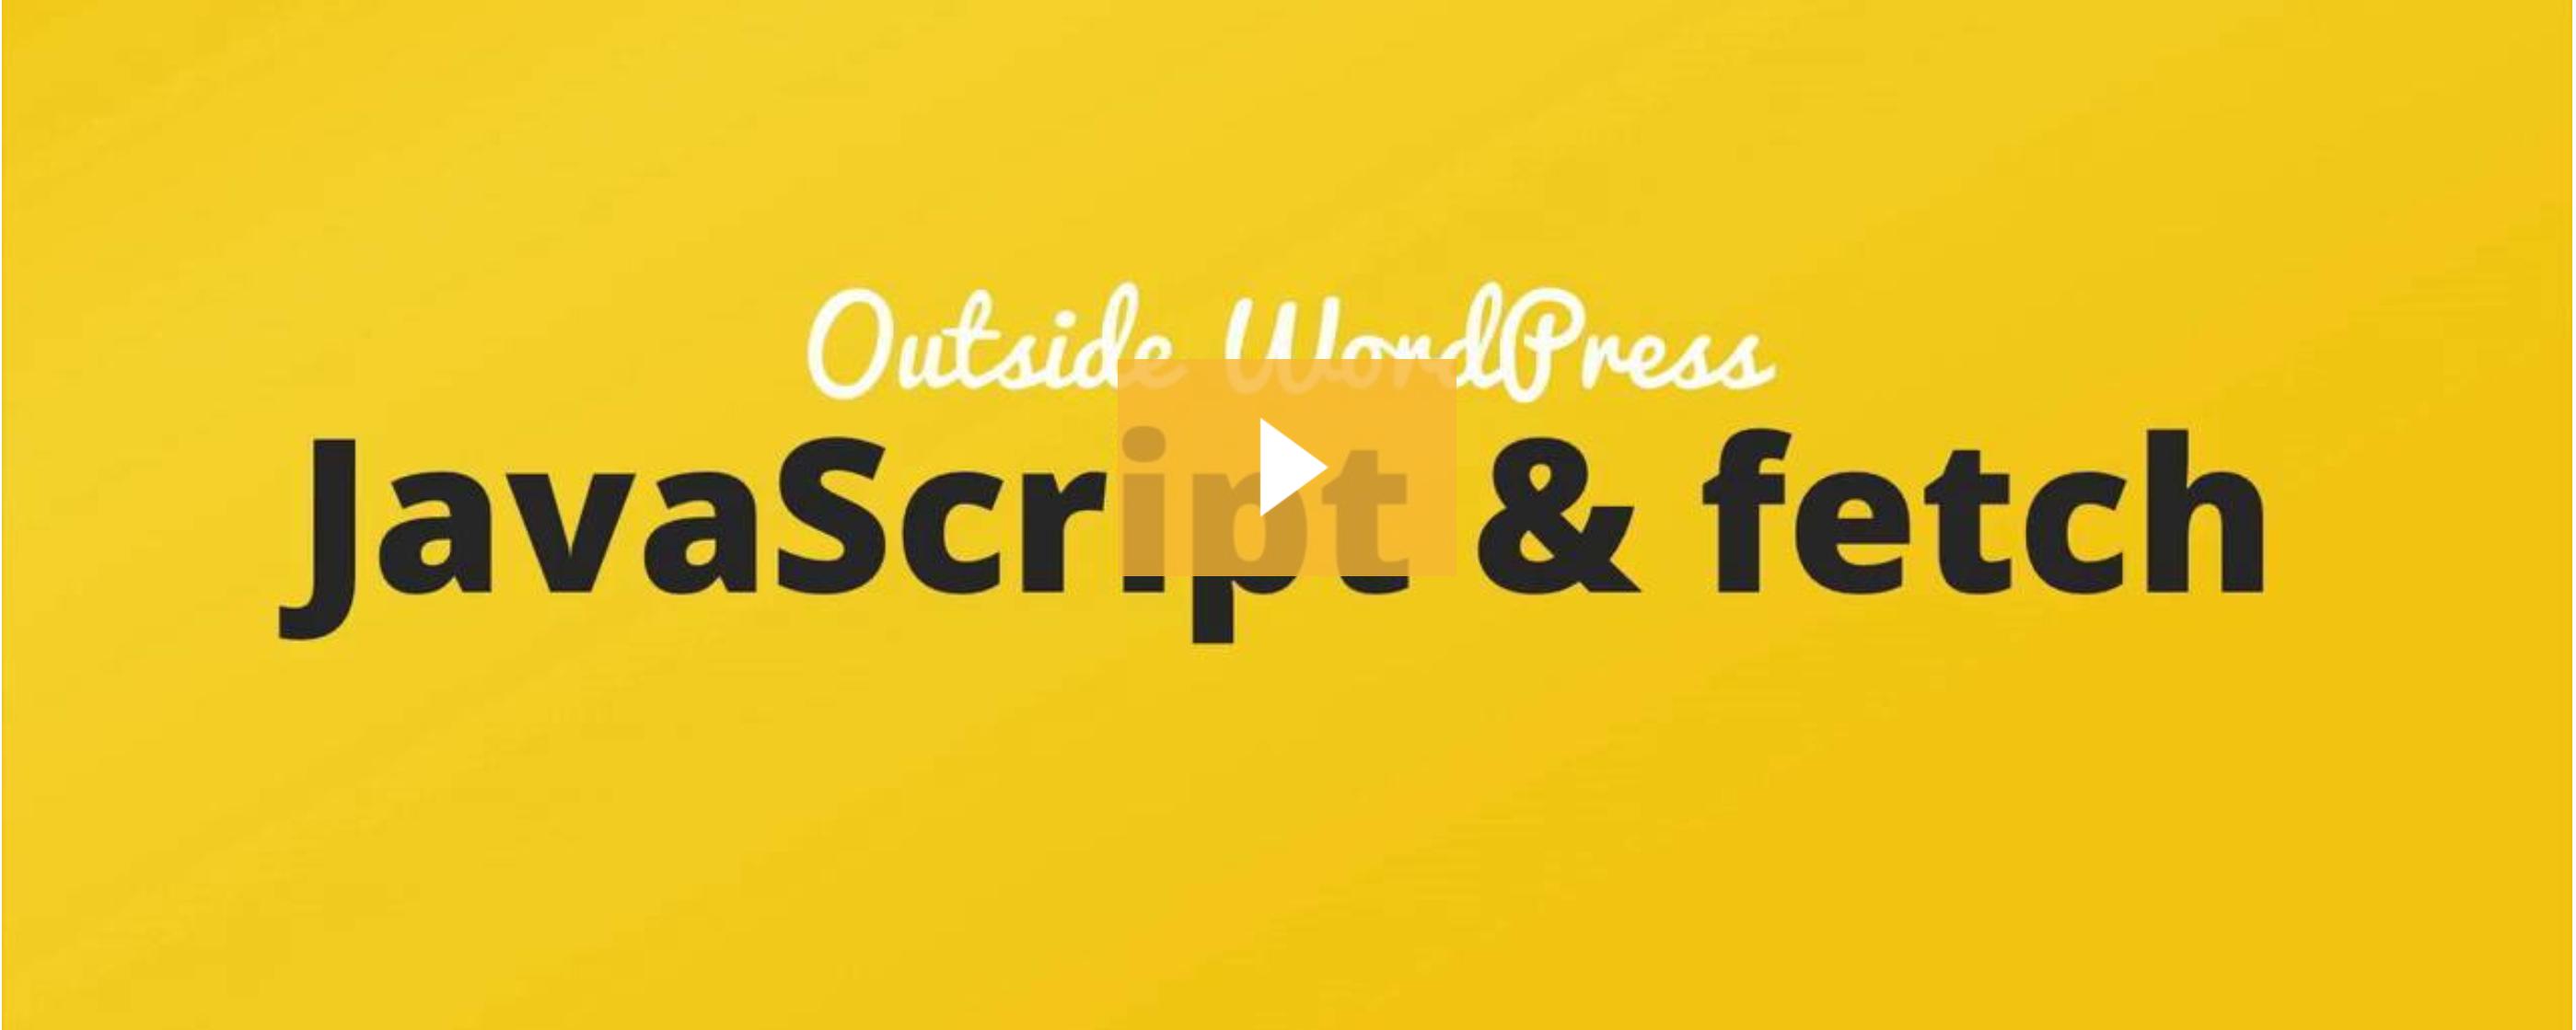 Decoupled WordPress REST API Calls with Vanilla JavaScript, fetch and webpack